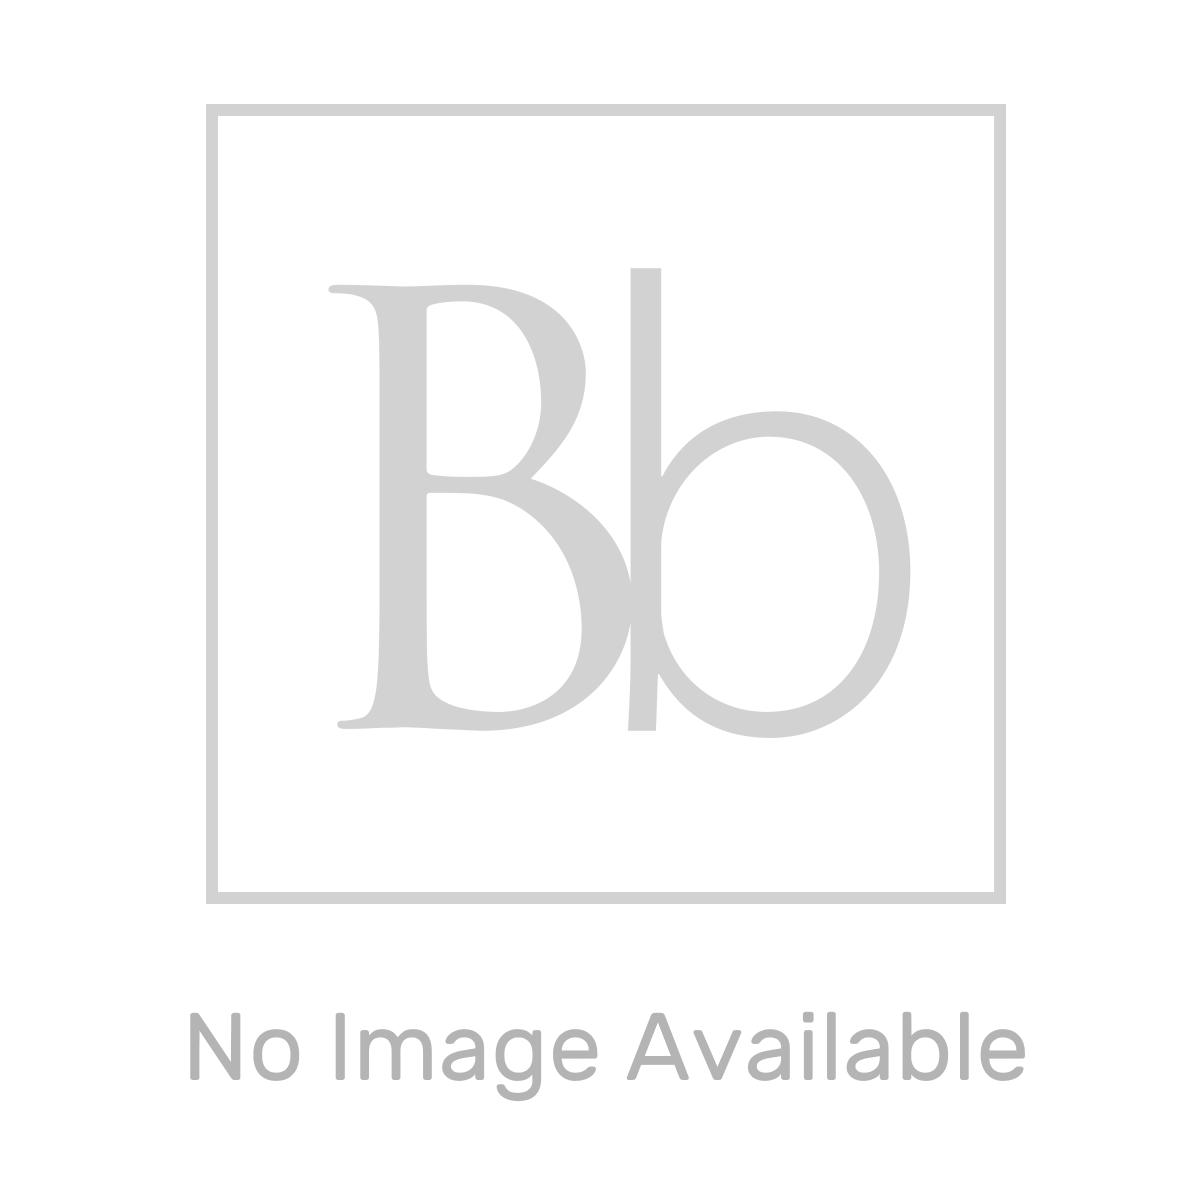 Nuie Merit Driftwood Wall Hung Single Door Vanity & Basin 500mm Line Drawing